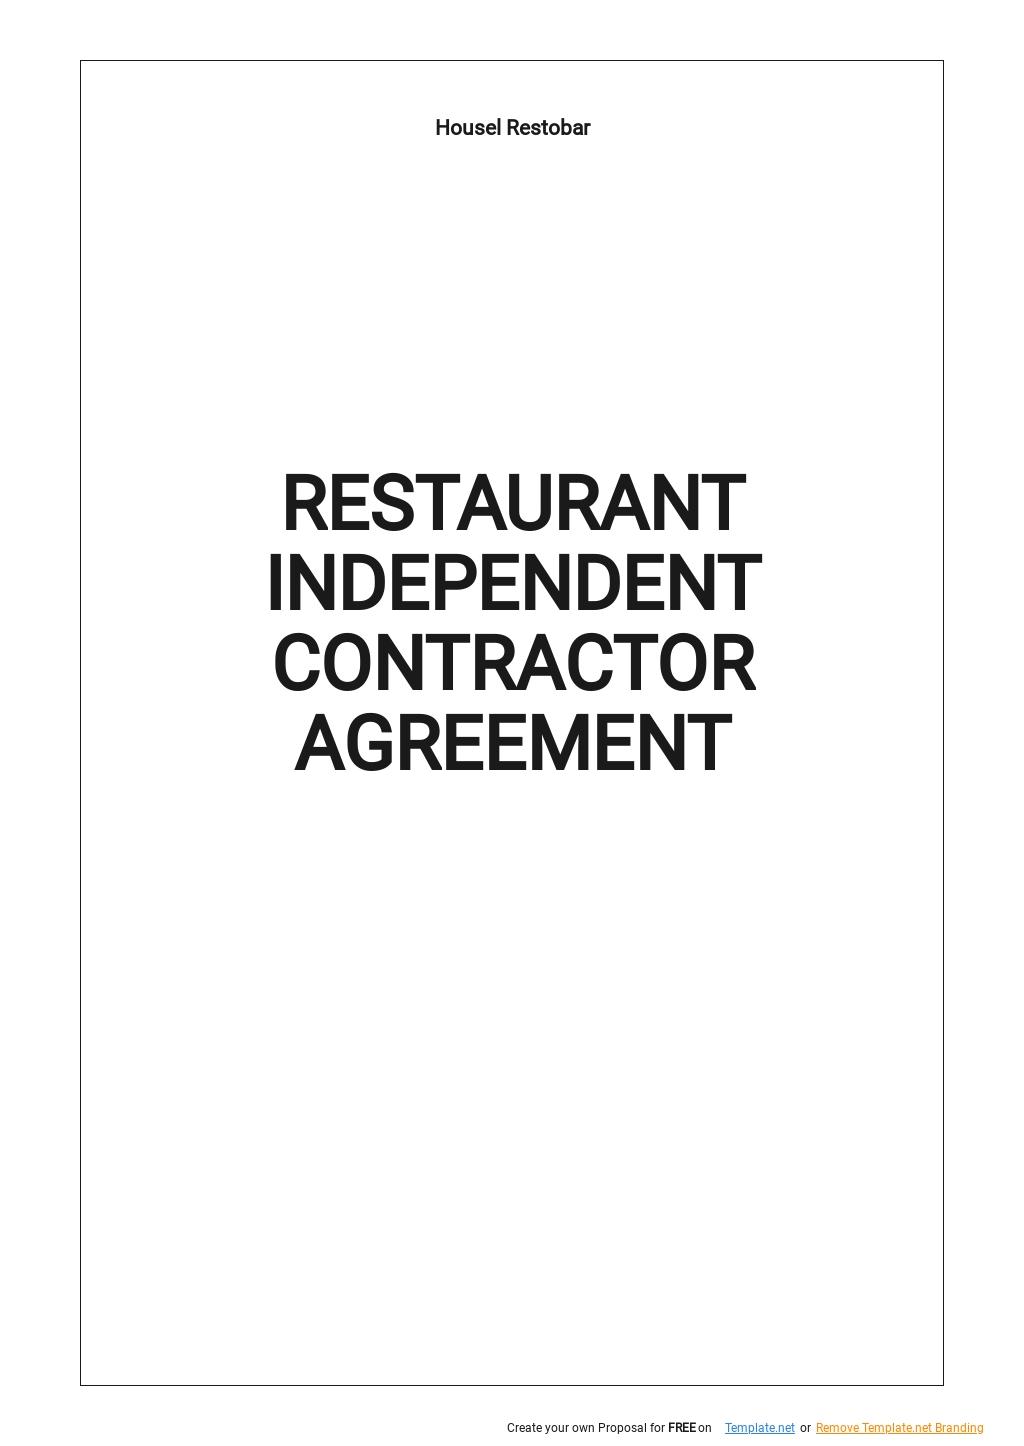 Restaurant Independent Contractor Agreement Template.jpe